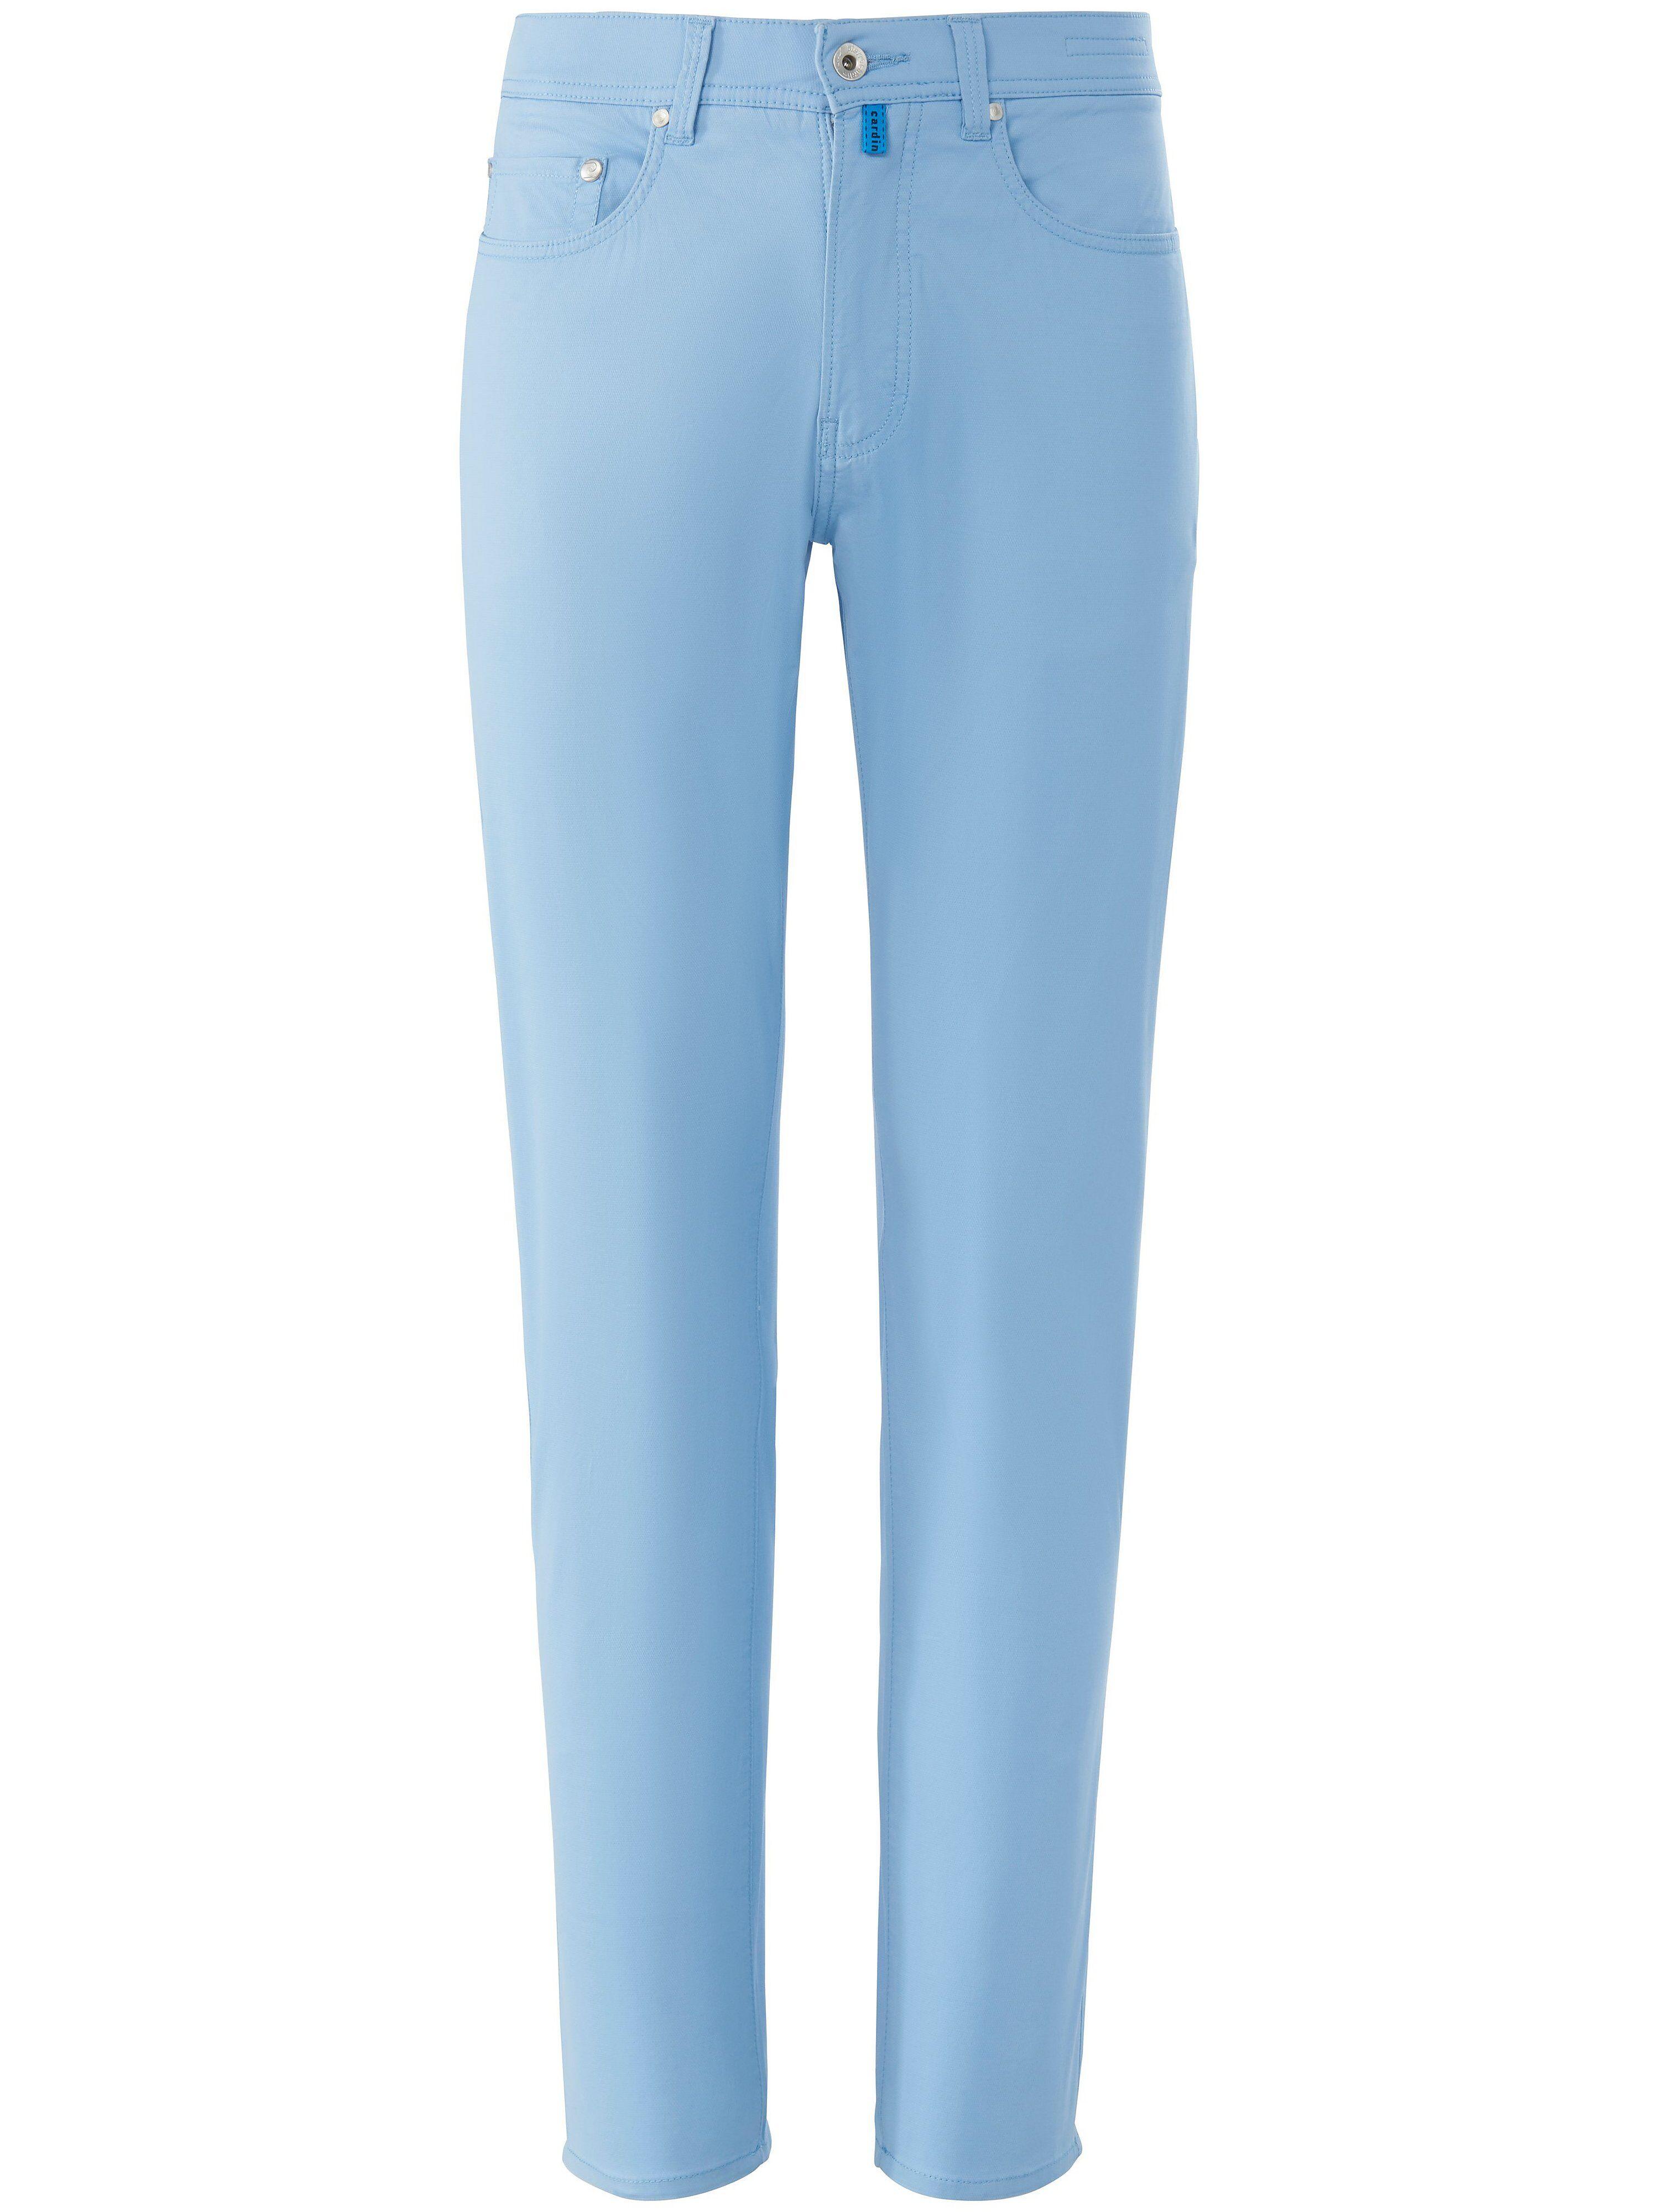 Pierre Cardin Le pantalon Regular Fit modèle Lyon Tapered  Pierre Cardin bleu  - Homme - 25